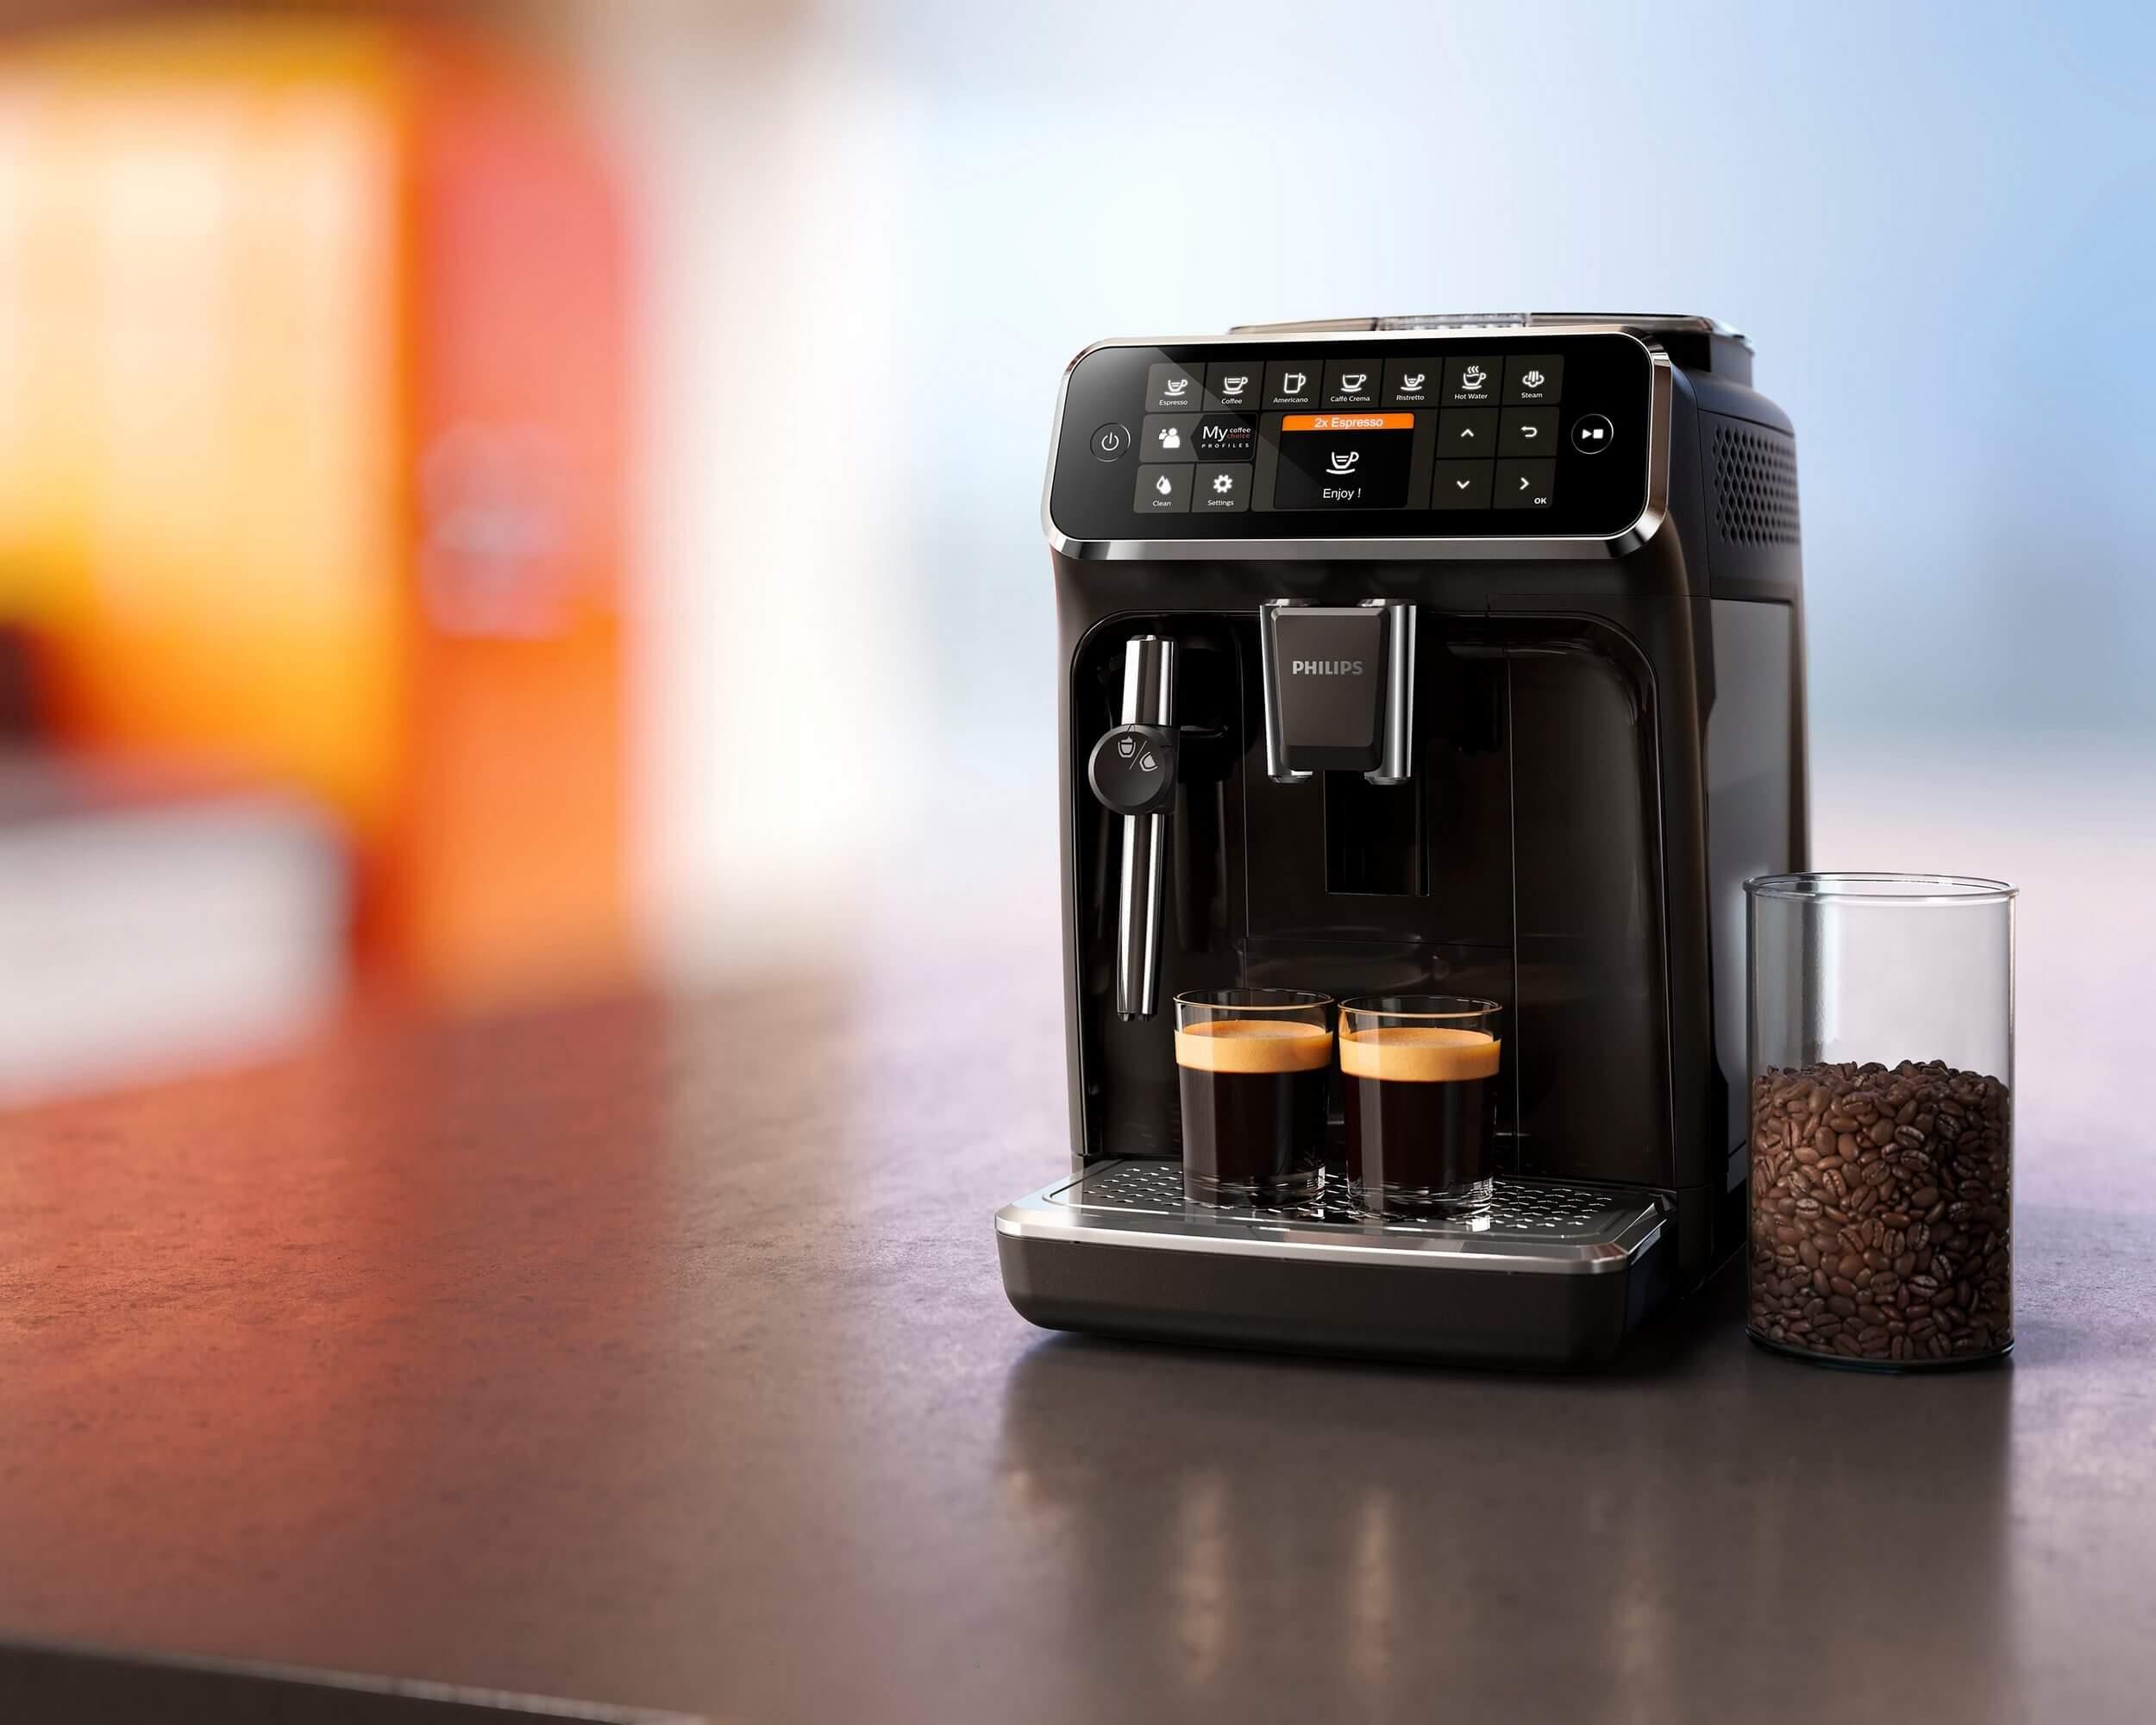 Philips espresso machine EP4321 dominokala 8 - اسپرسو ساز فیلیپس EP4321